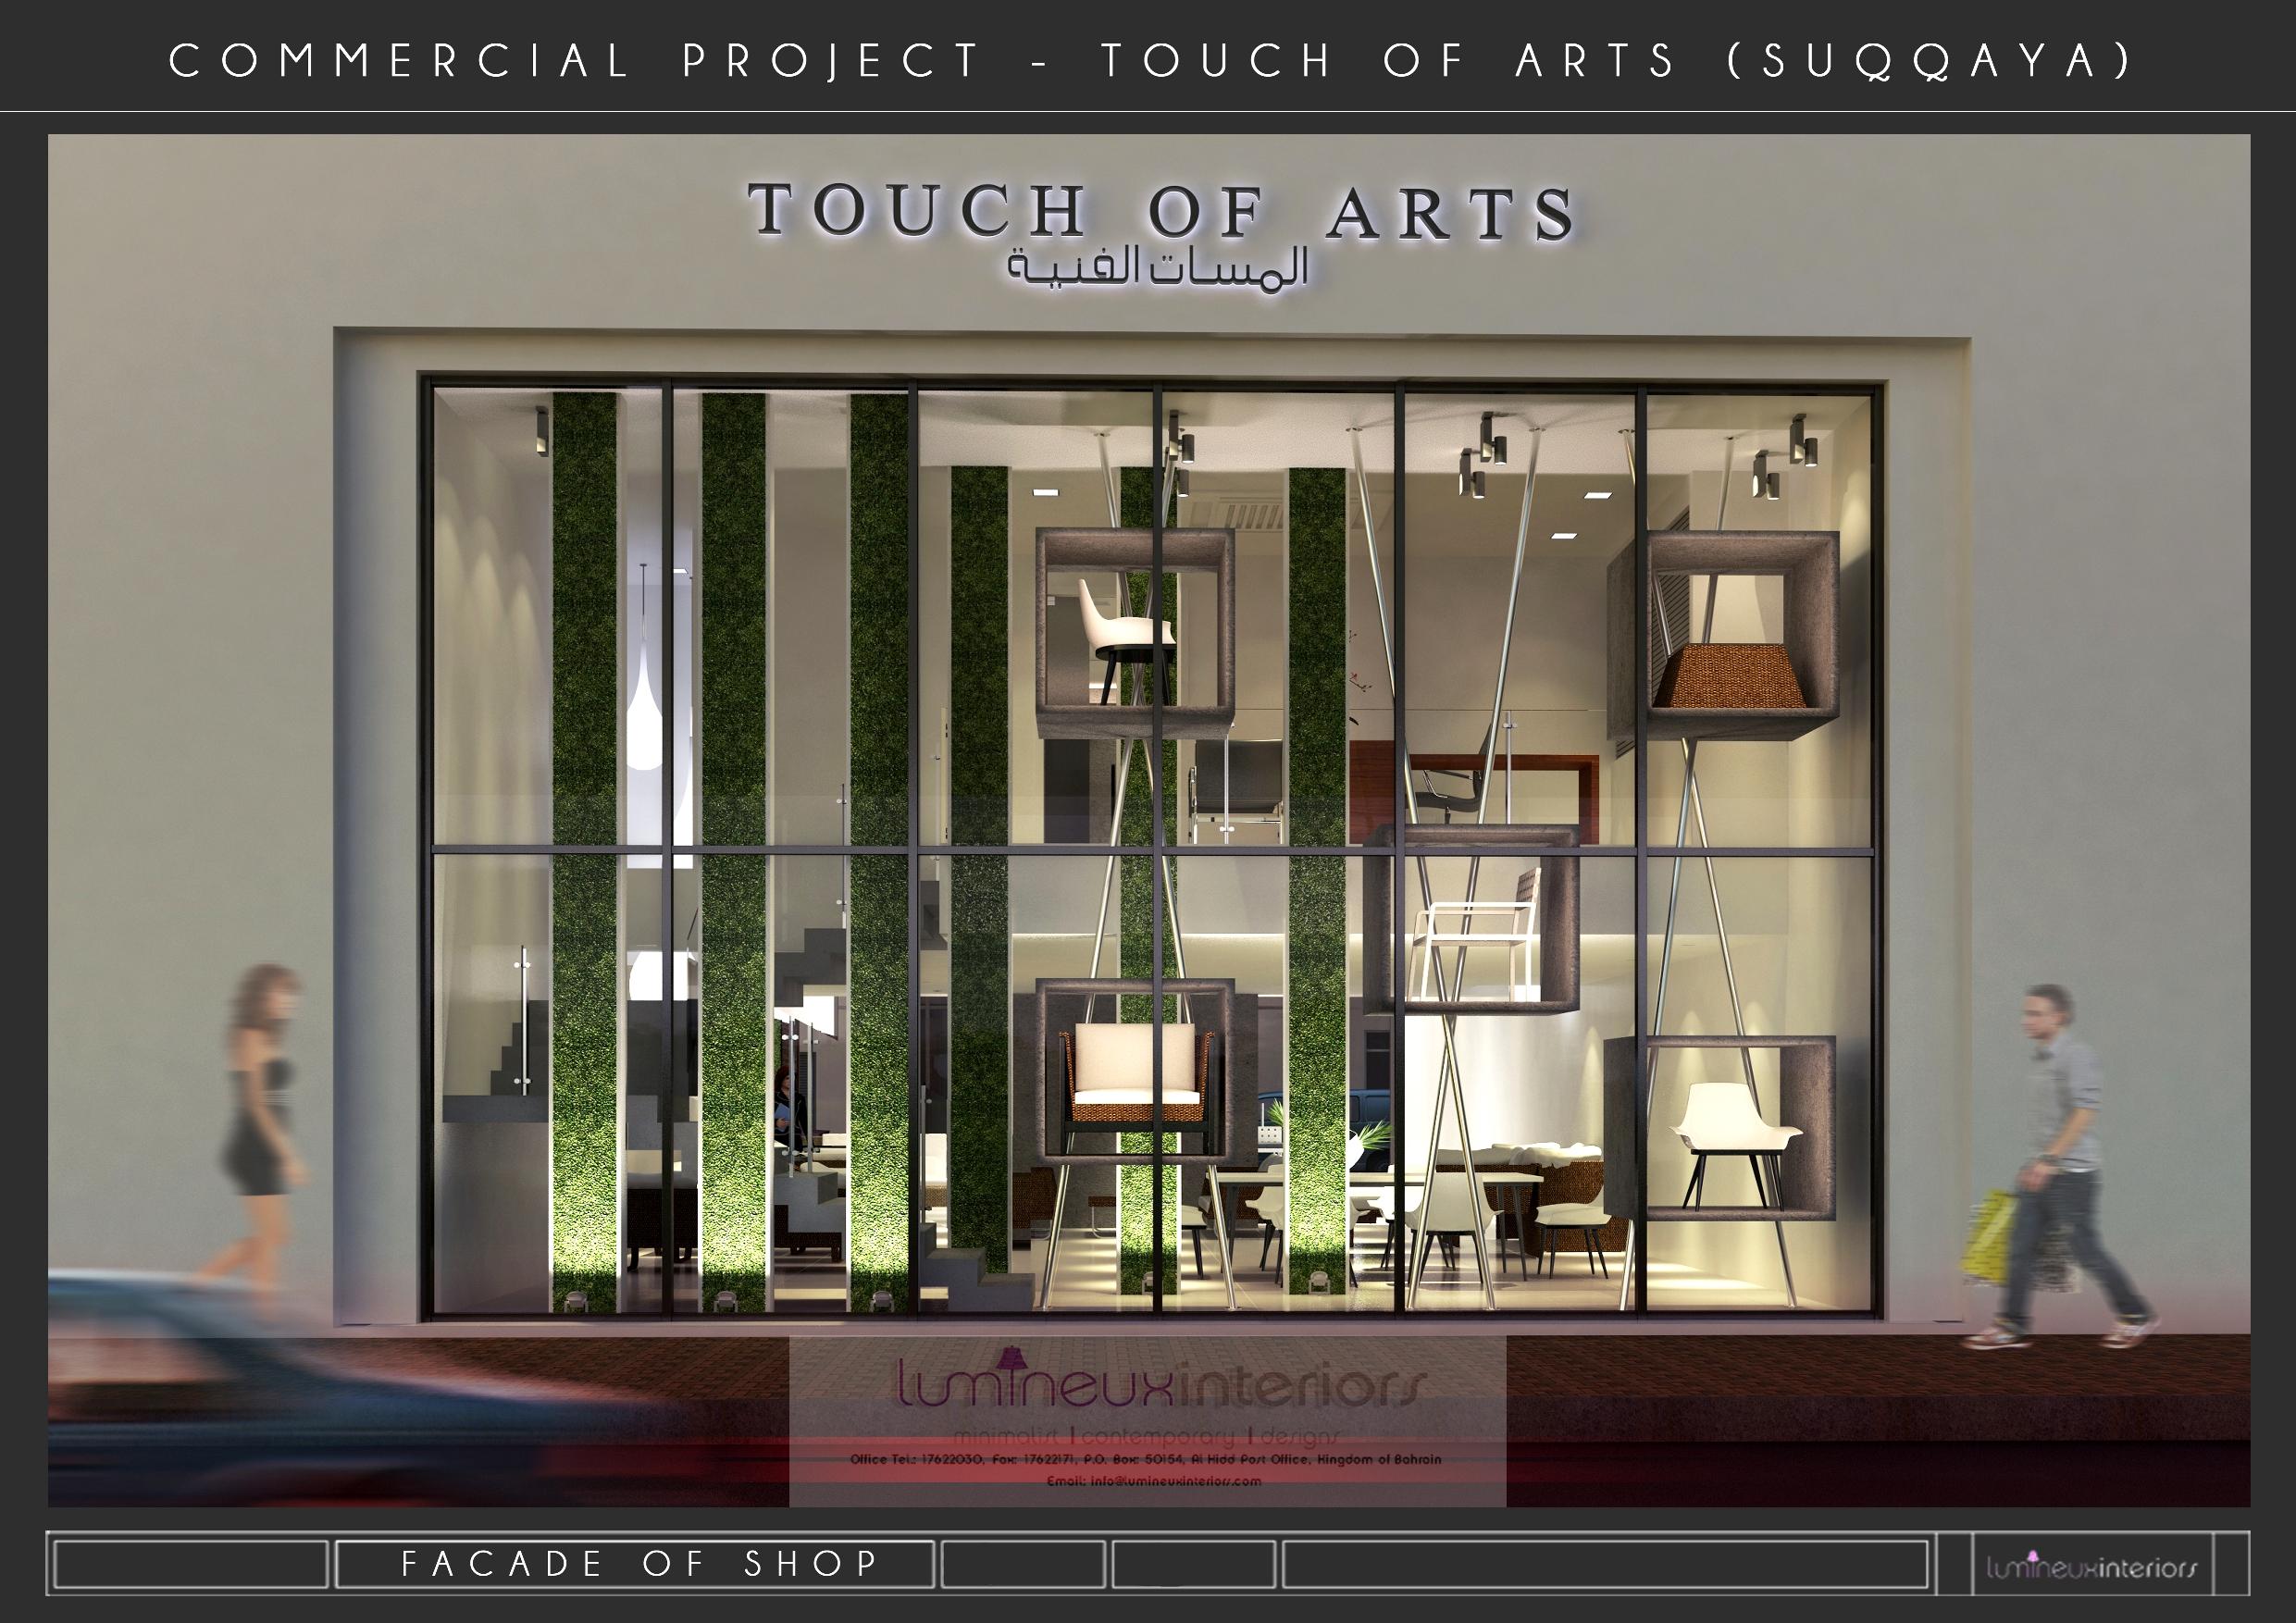 Touch of Arts (SUQQAYA)